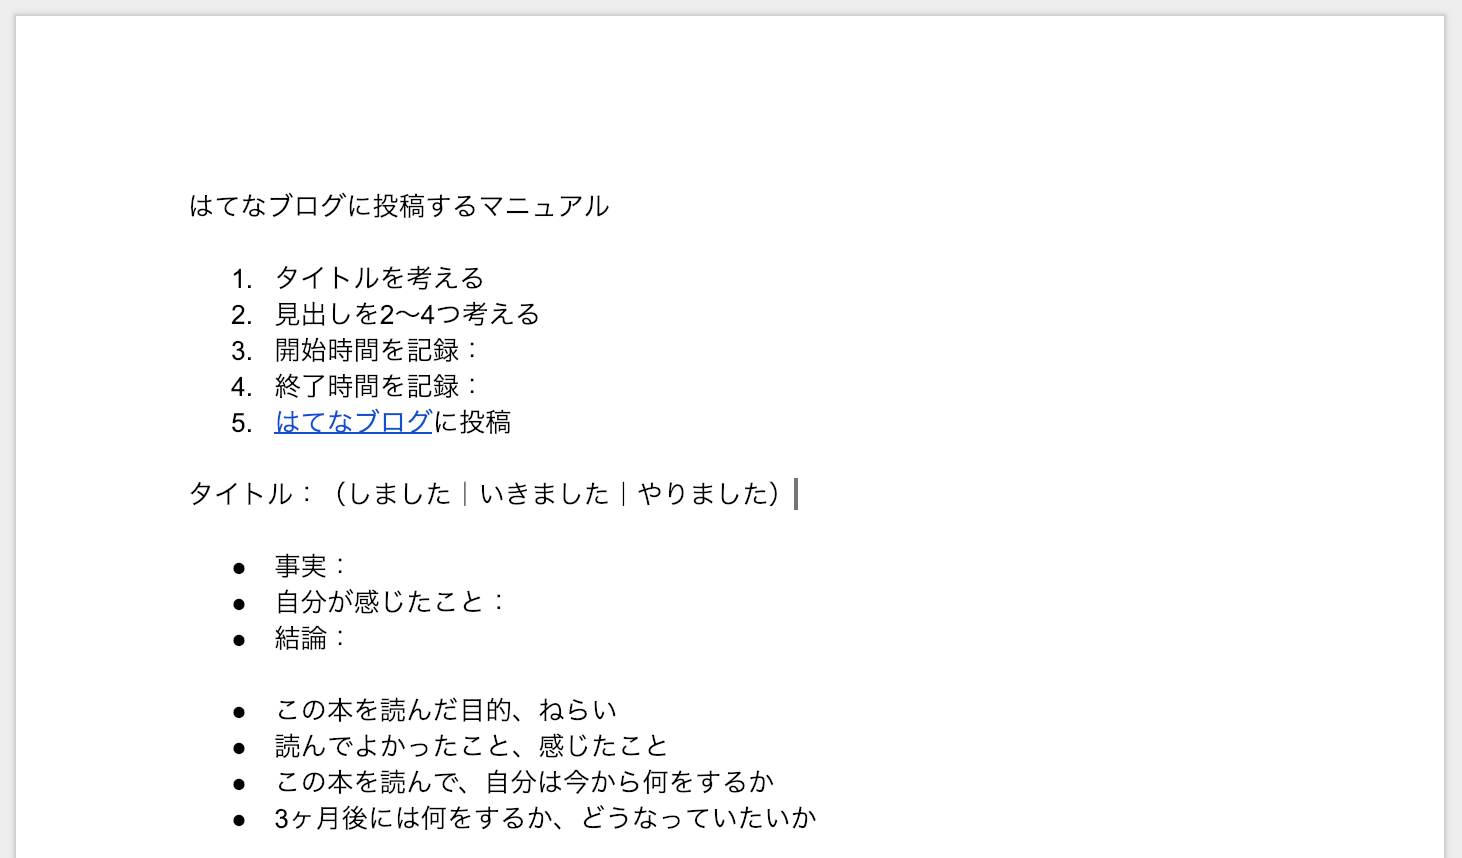 f:id:toyoshi:20190115213639p:plain